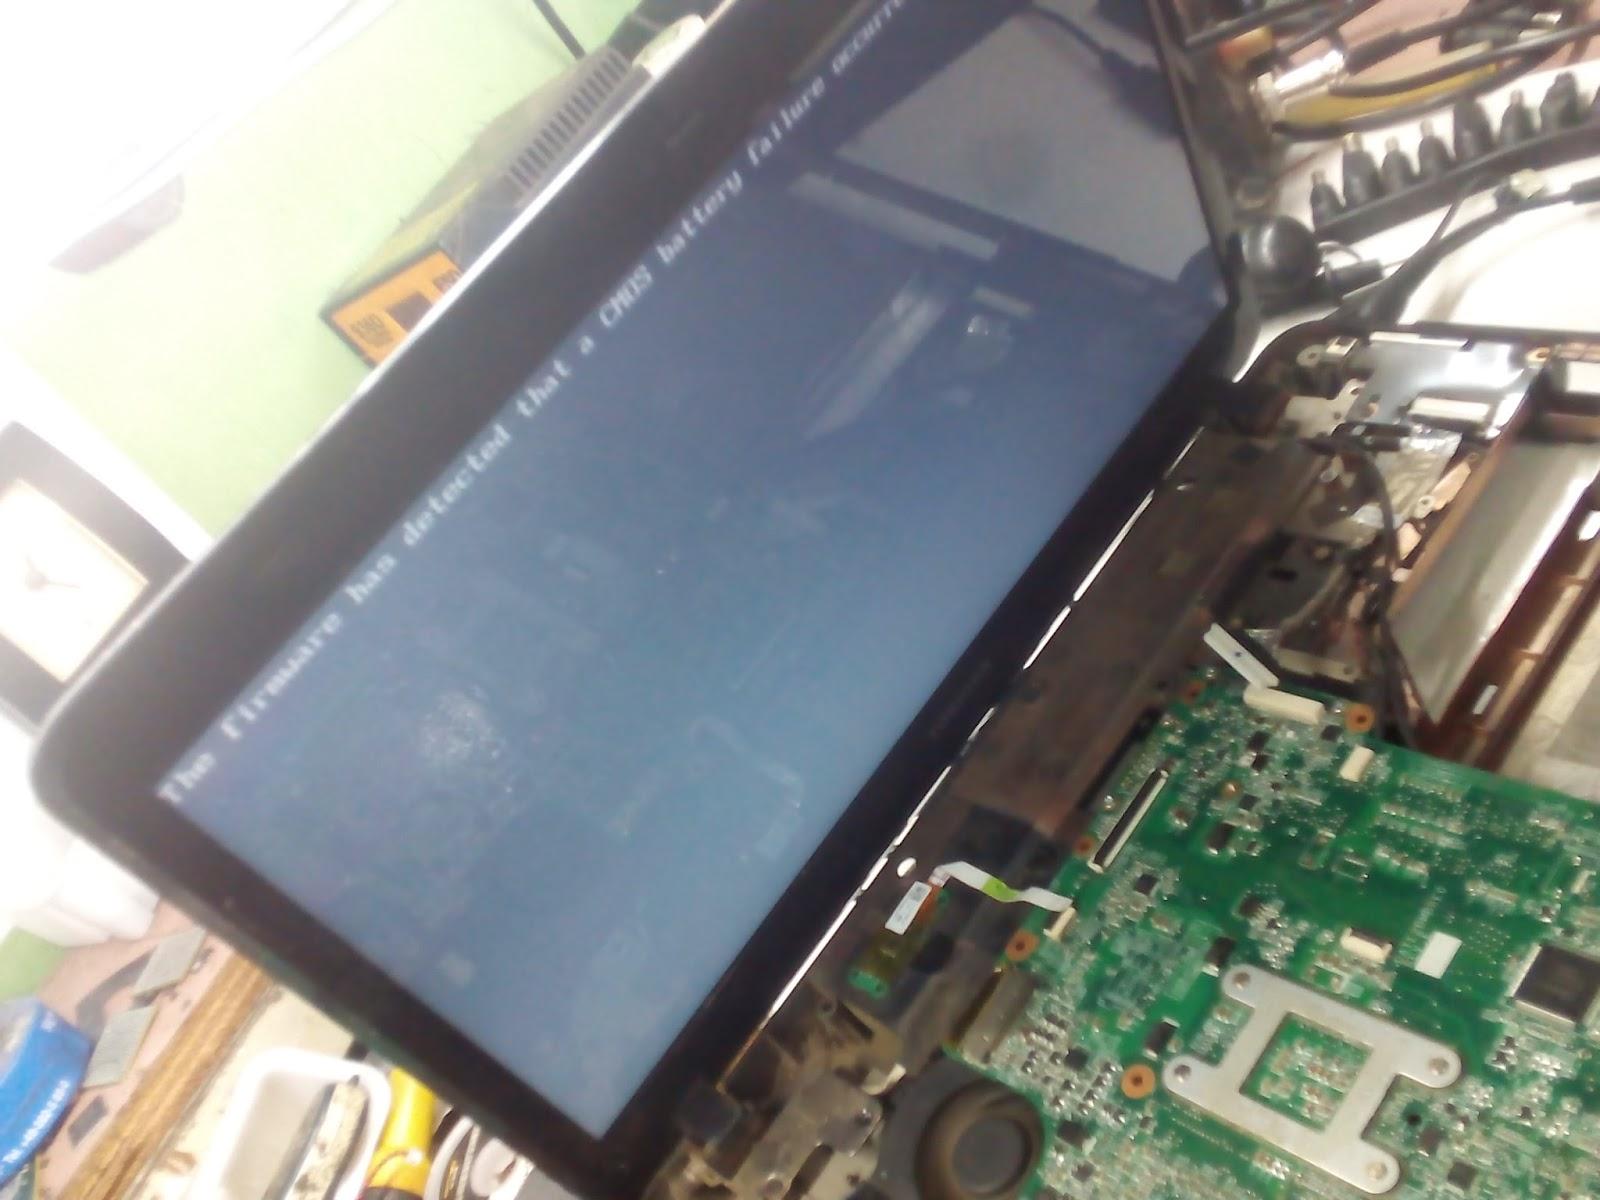 Kami Melayani Servis Laptop di Malang Servis Notebook di Kota Malang pada semua kerusakan laptop notebook acer laptop notebook Toshiba laptop notebook